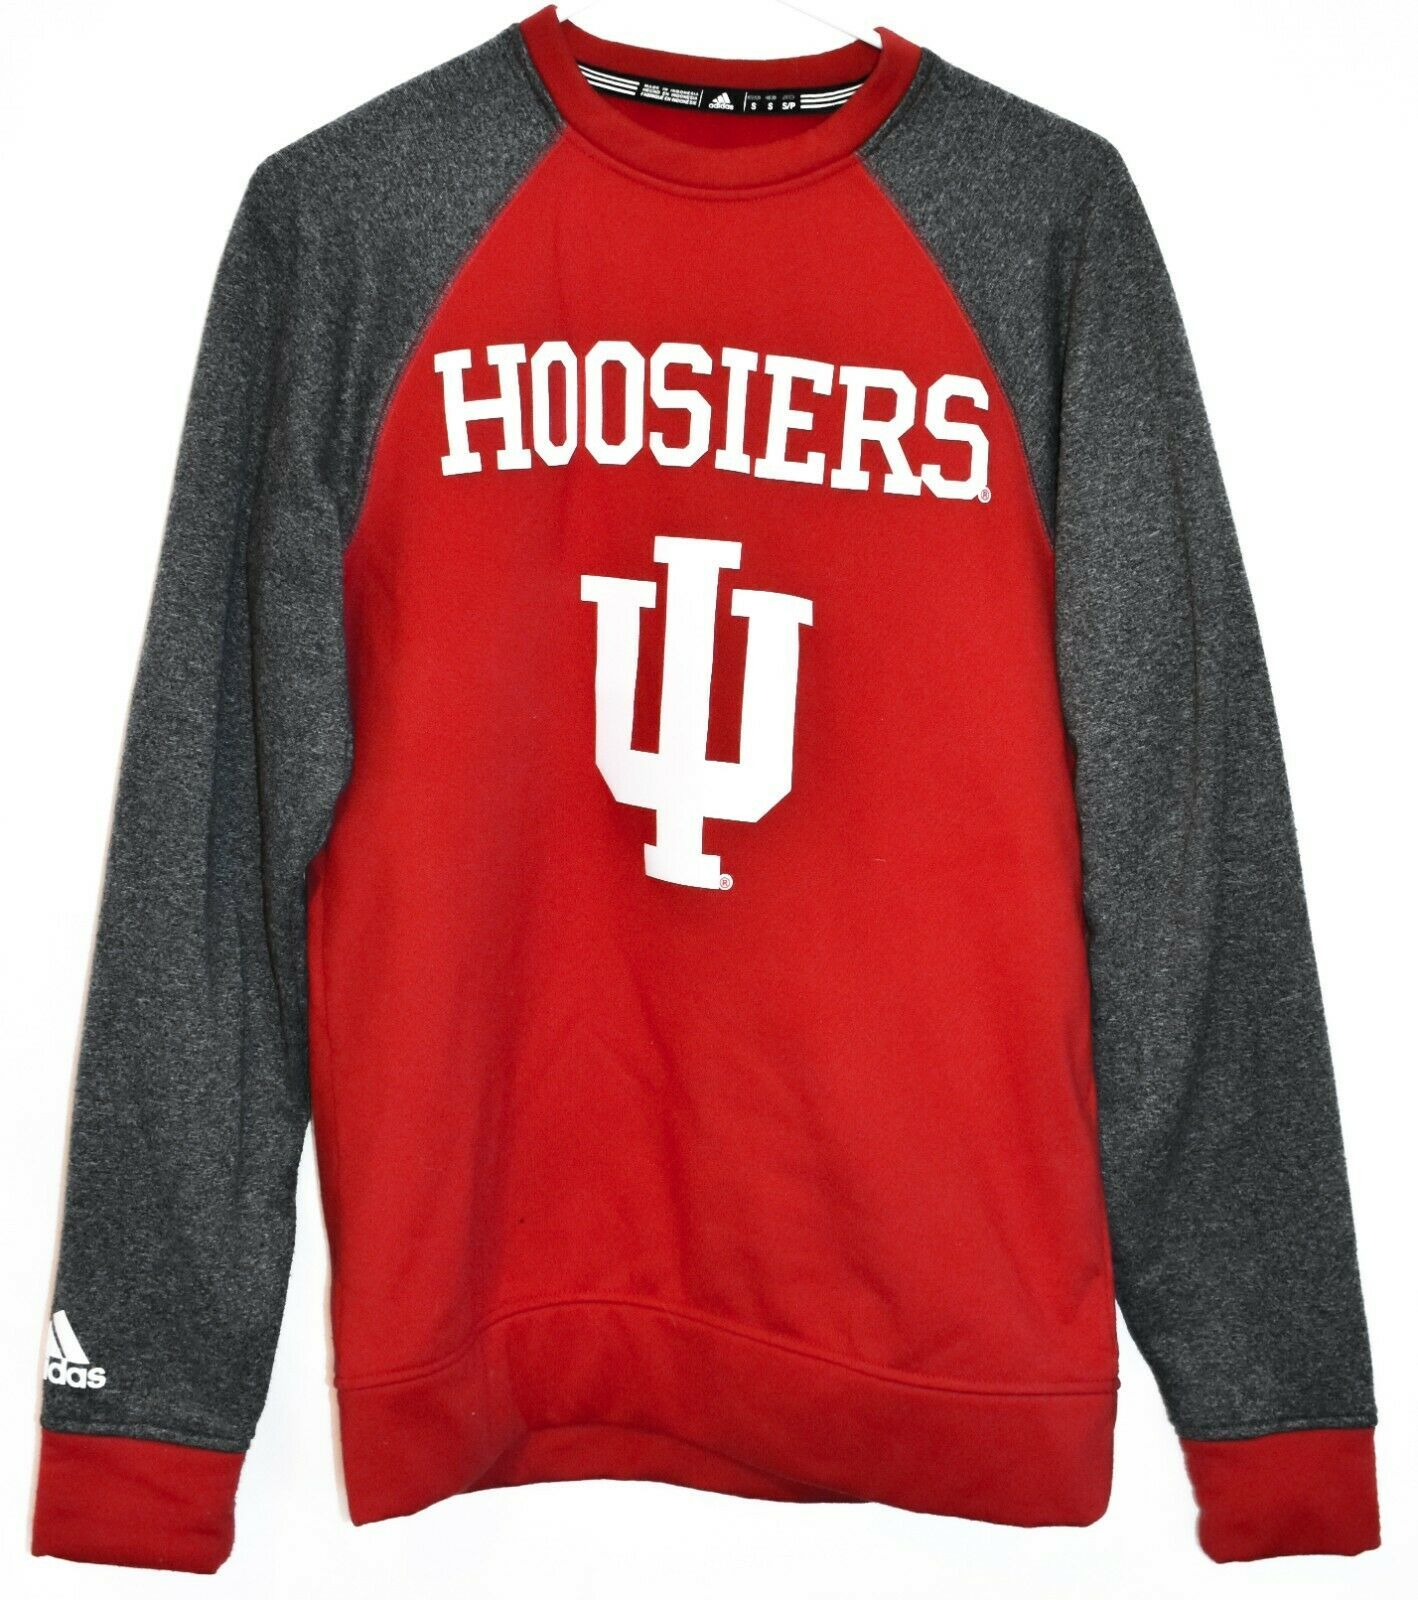 adidas Climawarm Indiana University Hoosiers Red & Gray Crew Sweatshirt Size S